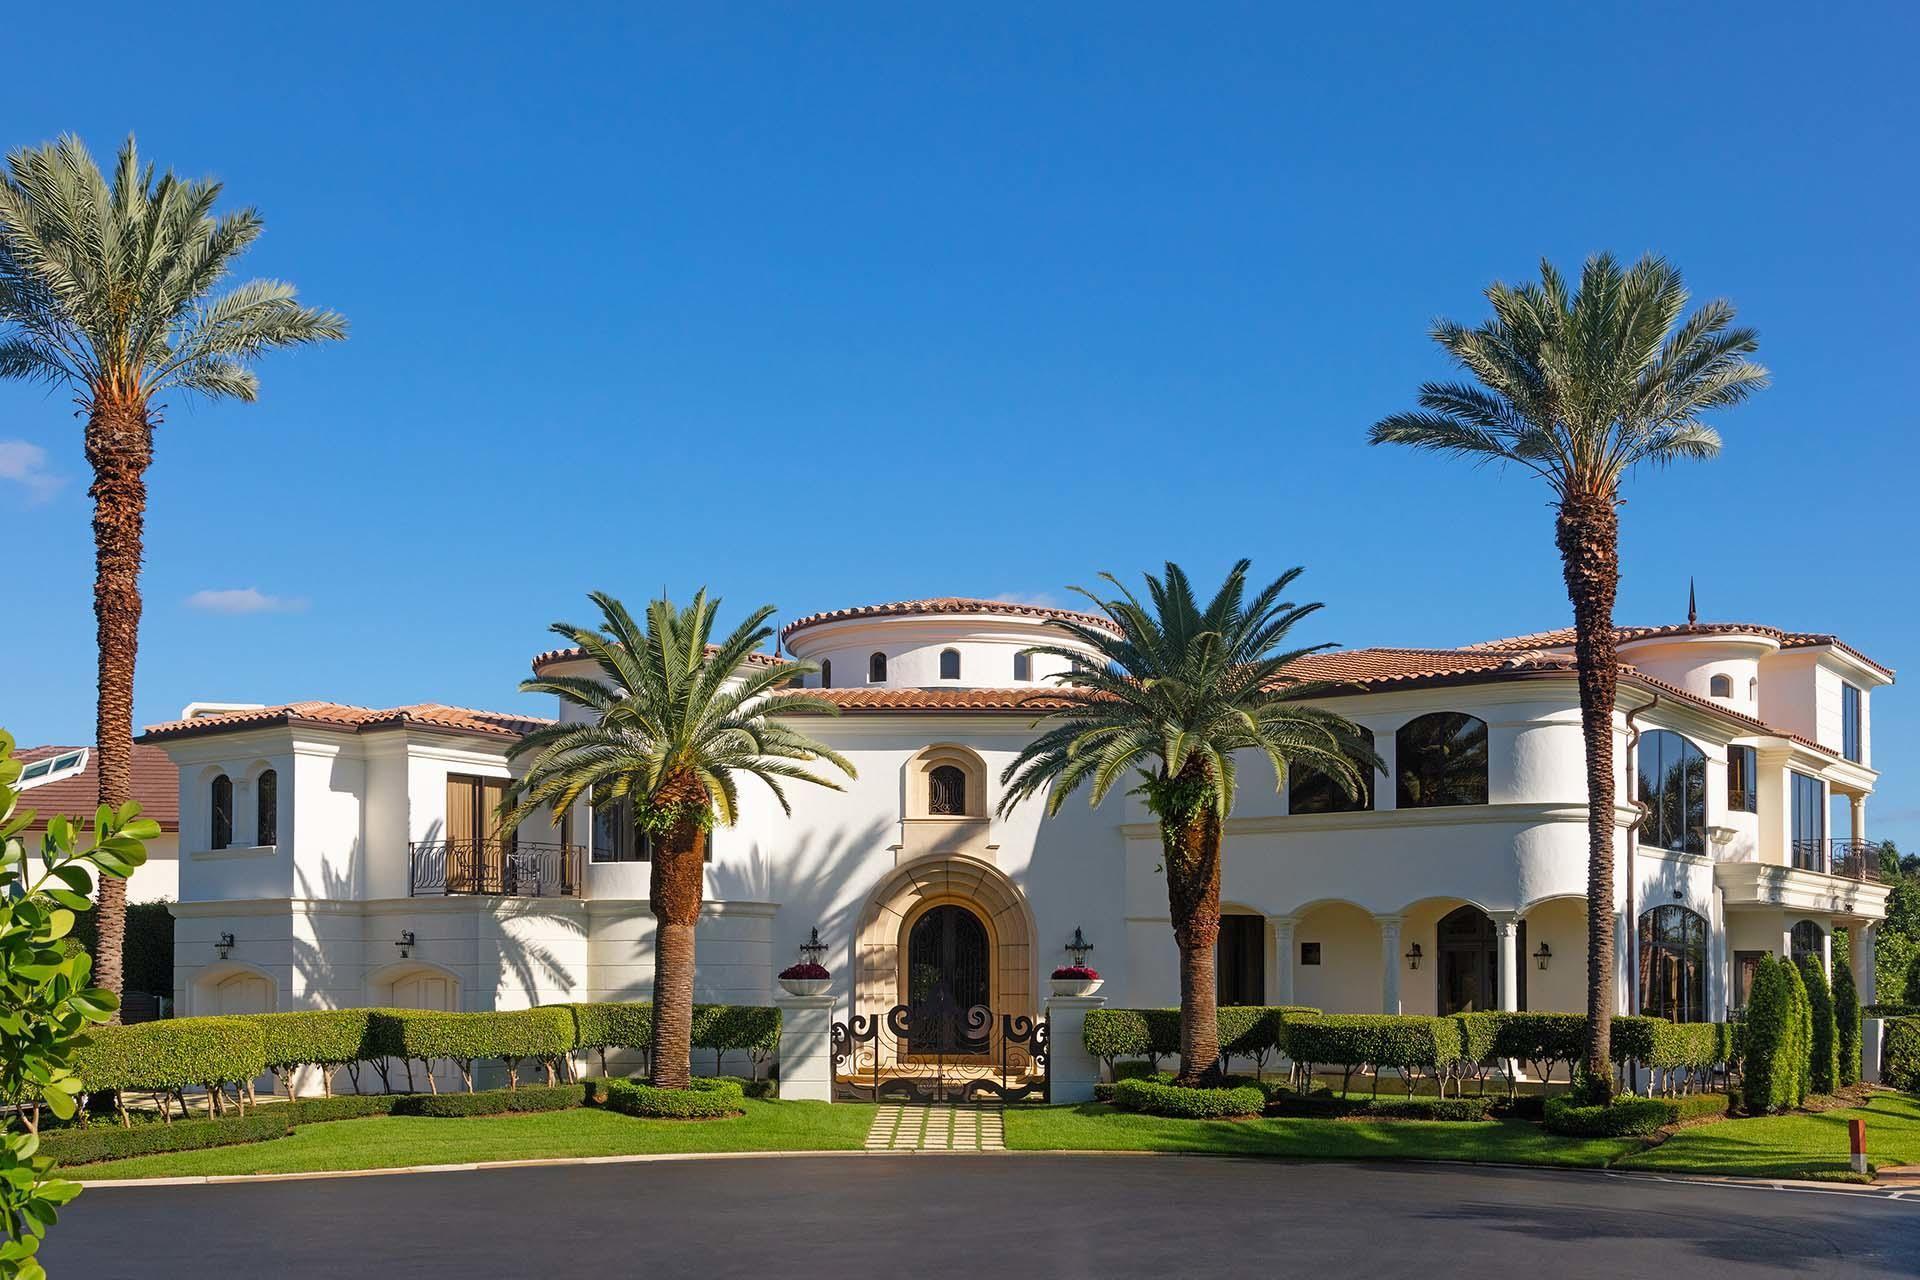 775 Oriole Circle, Boca Raton, FL 33431 - MLS#: RX-10605666